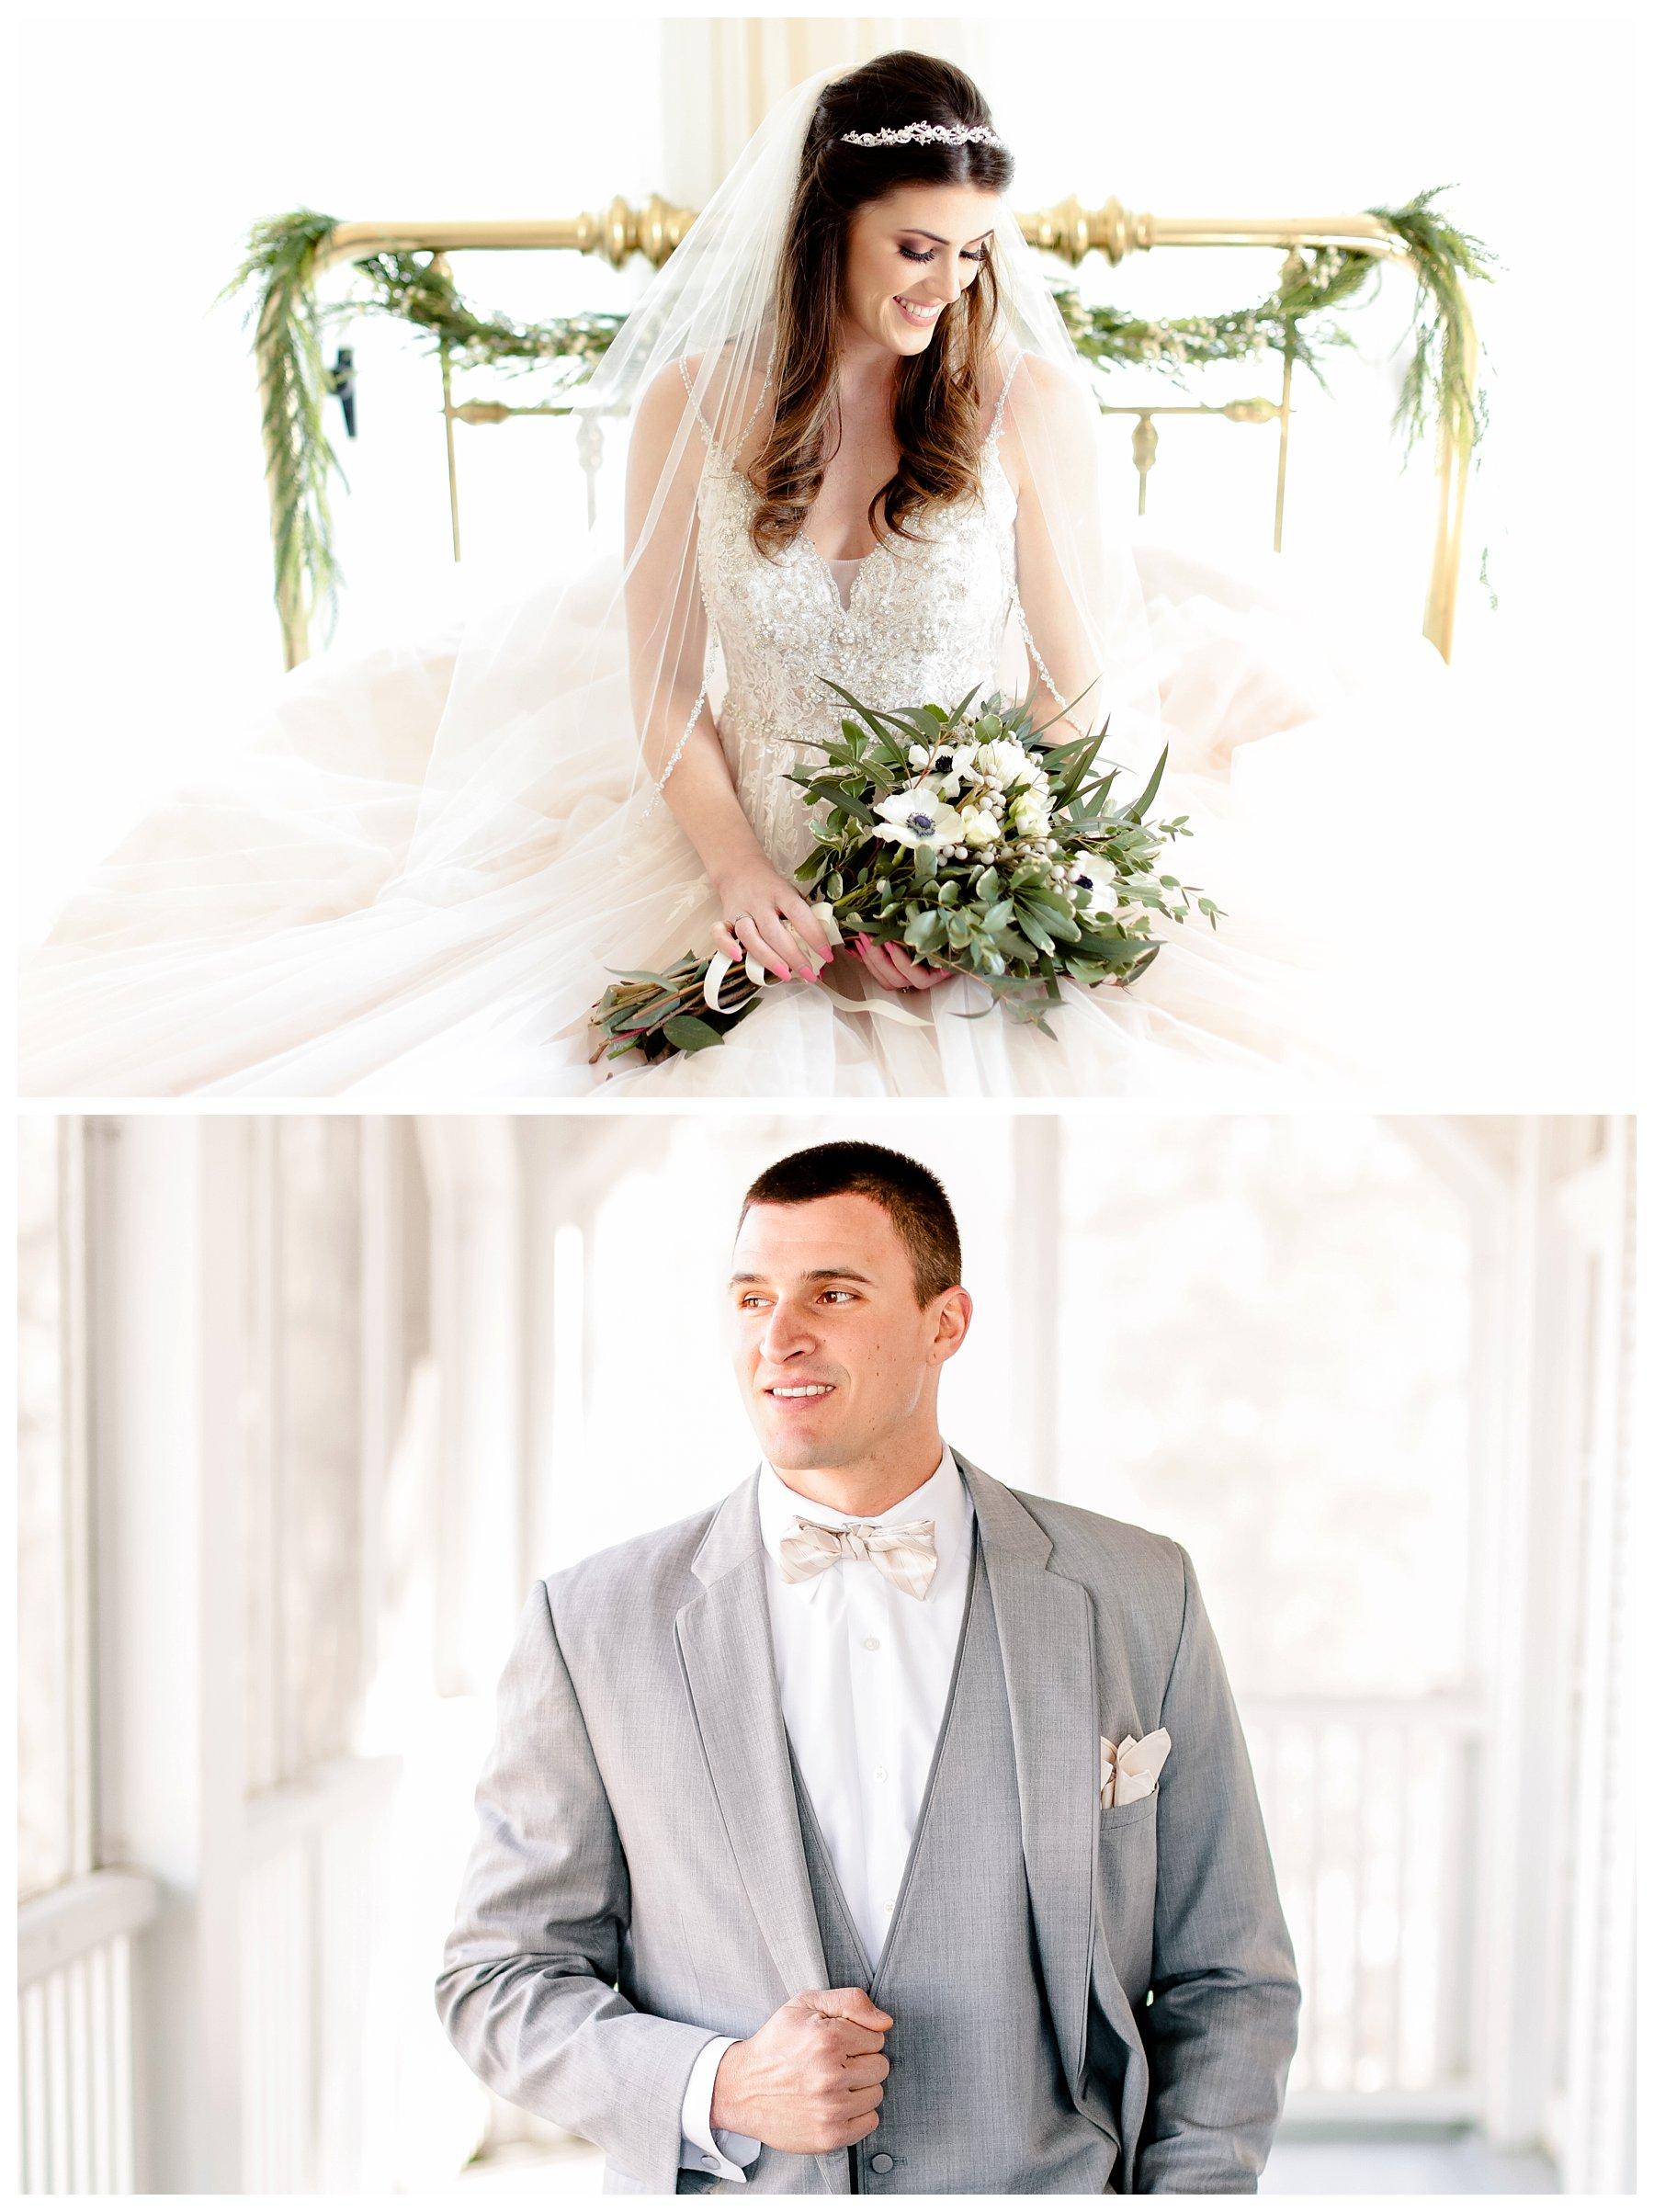 photographer_wedding_saint_louis_Kansas_City_Photography_Videography_workshop_training_styled_engagement_Lake_Ozark_KC_MO_STL_Rolla_Hermann_Saint_James_0403.jpg